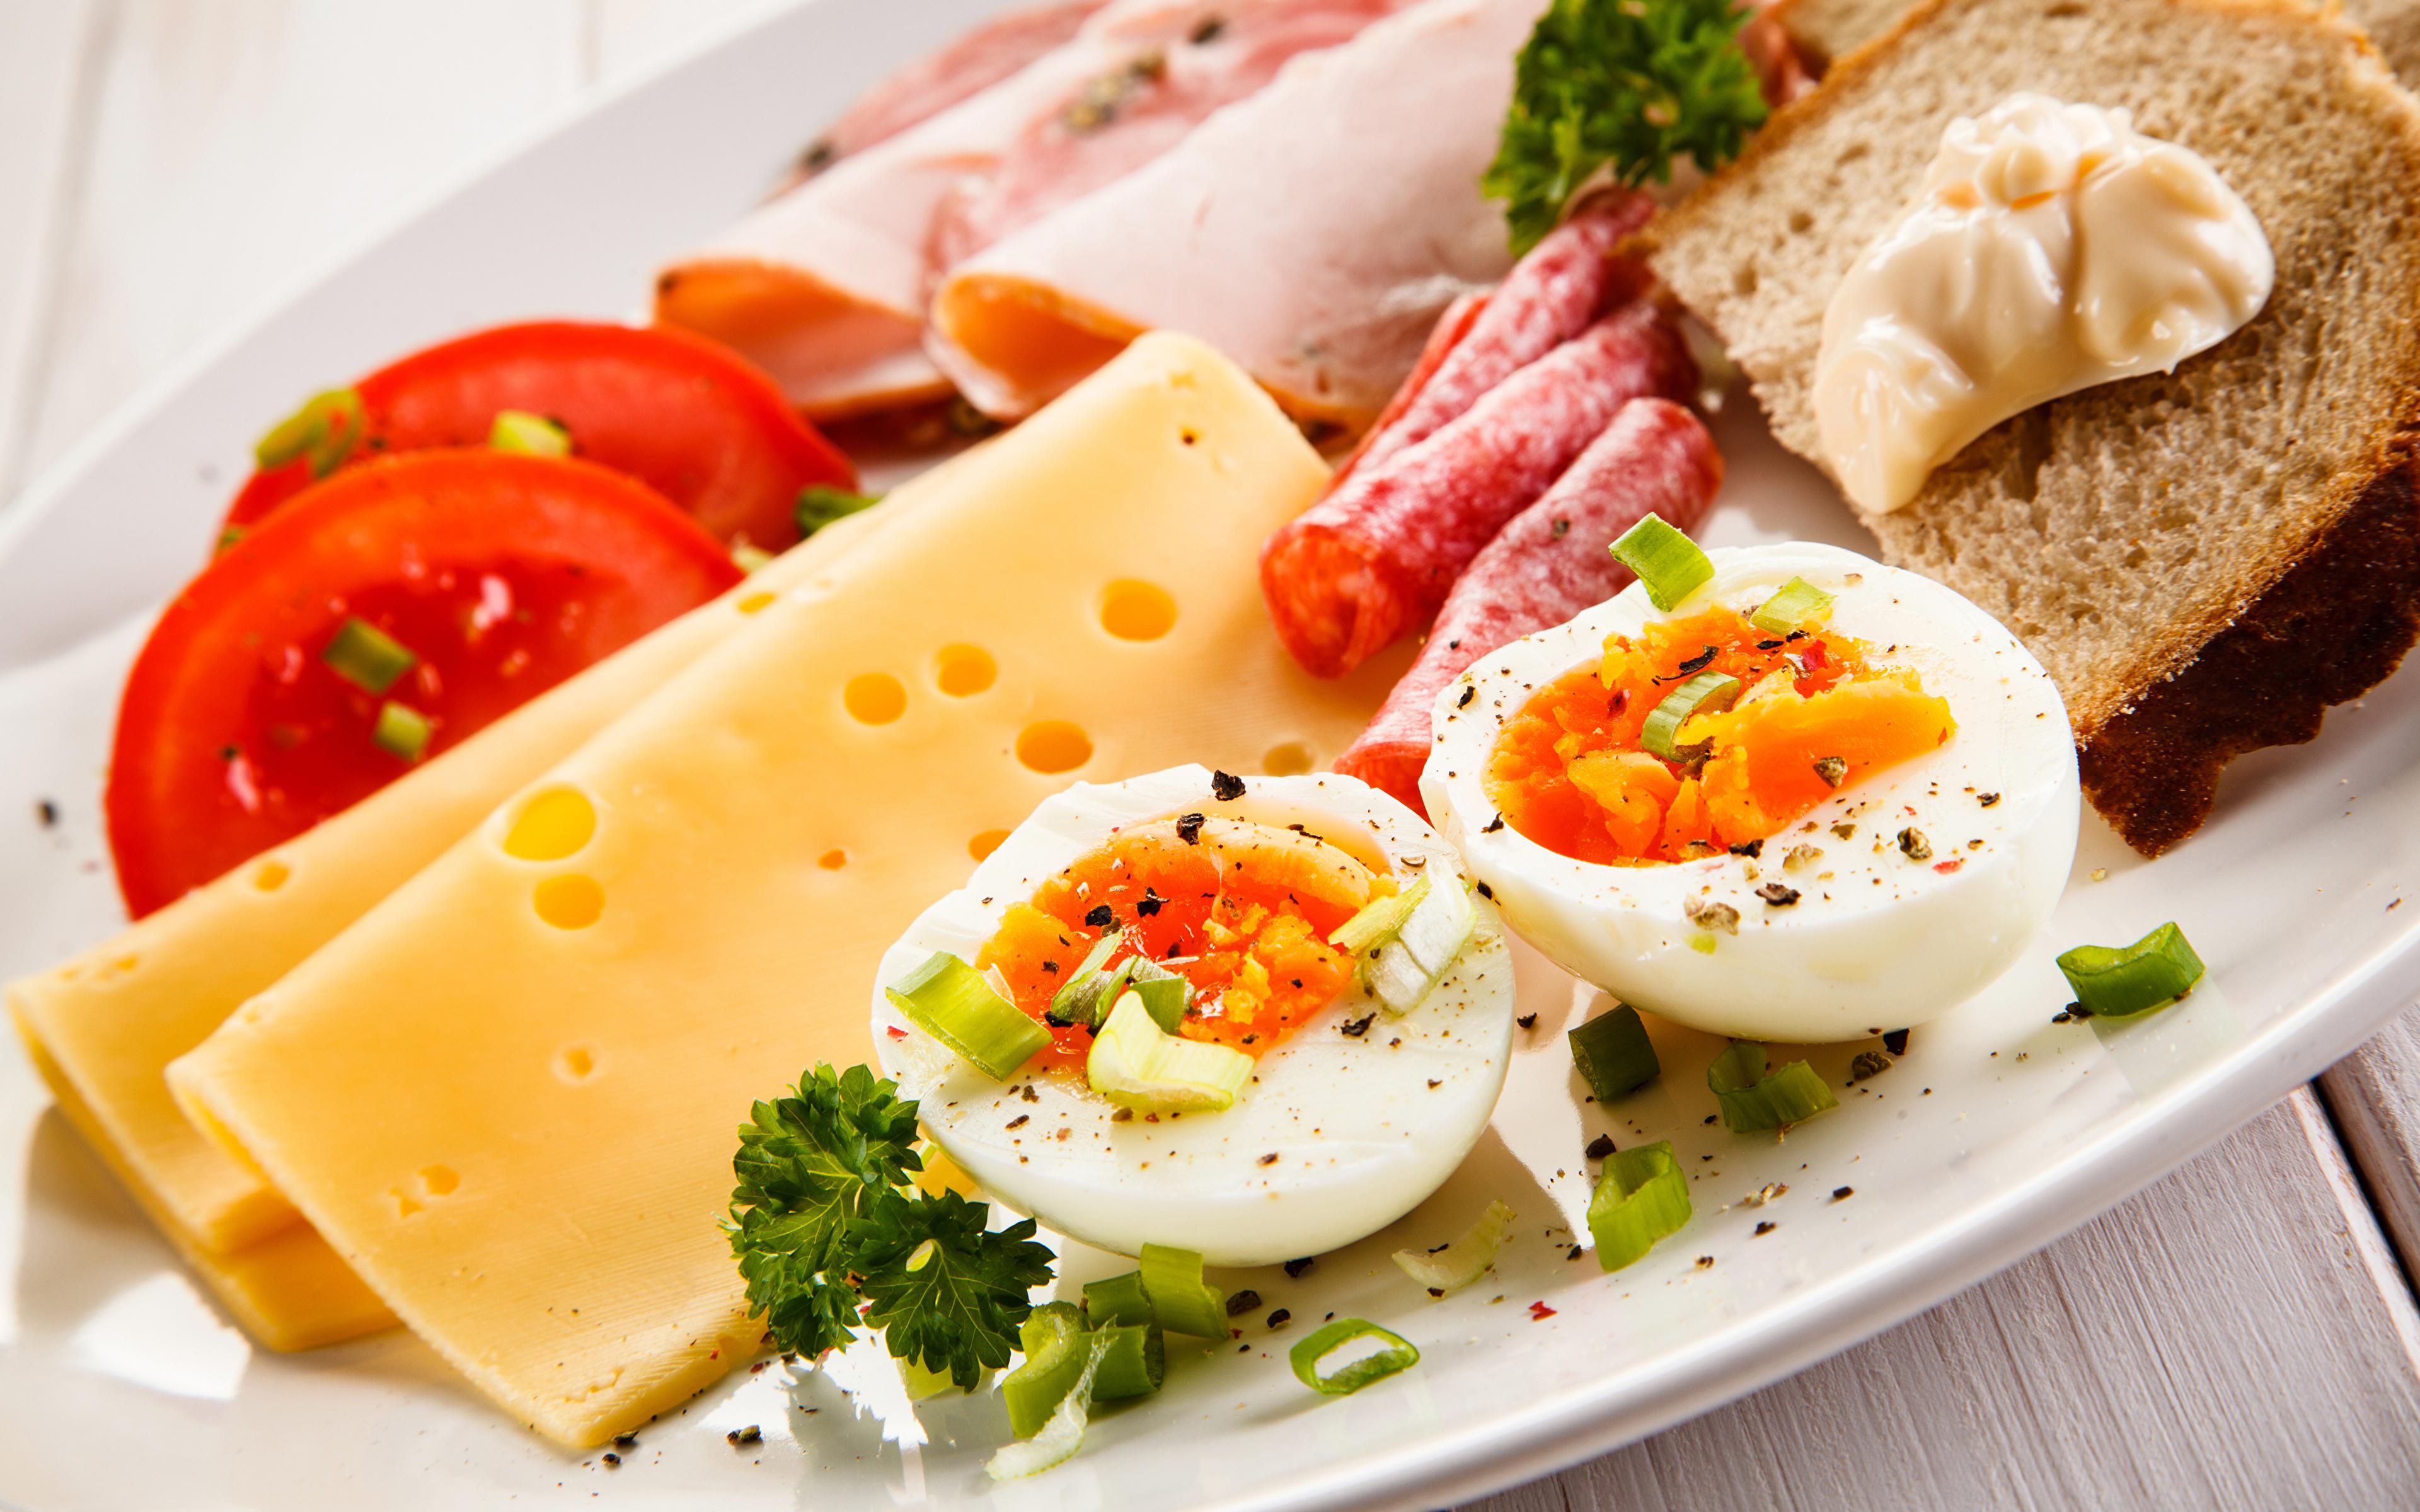 Cheese_Sausage_Bread_Vegetables_Breakfas